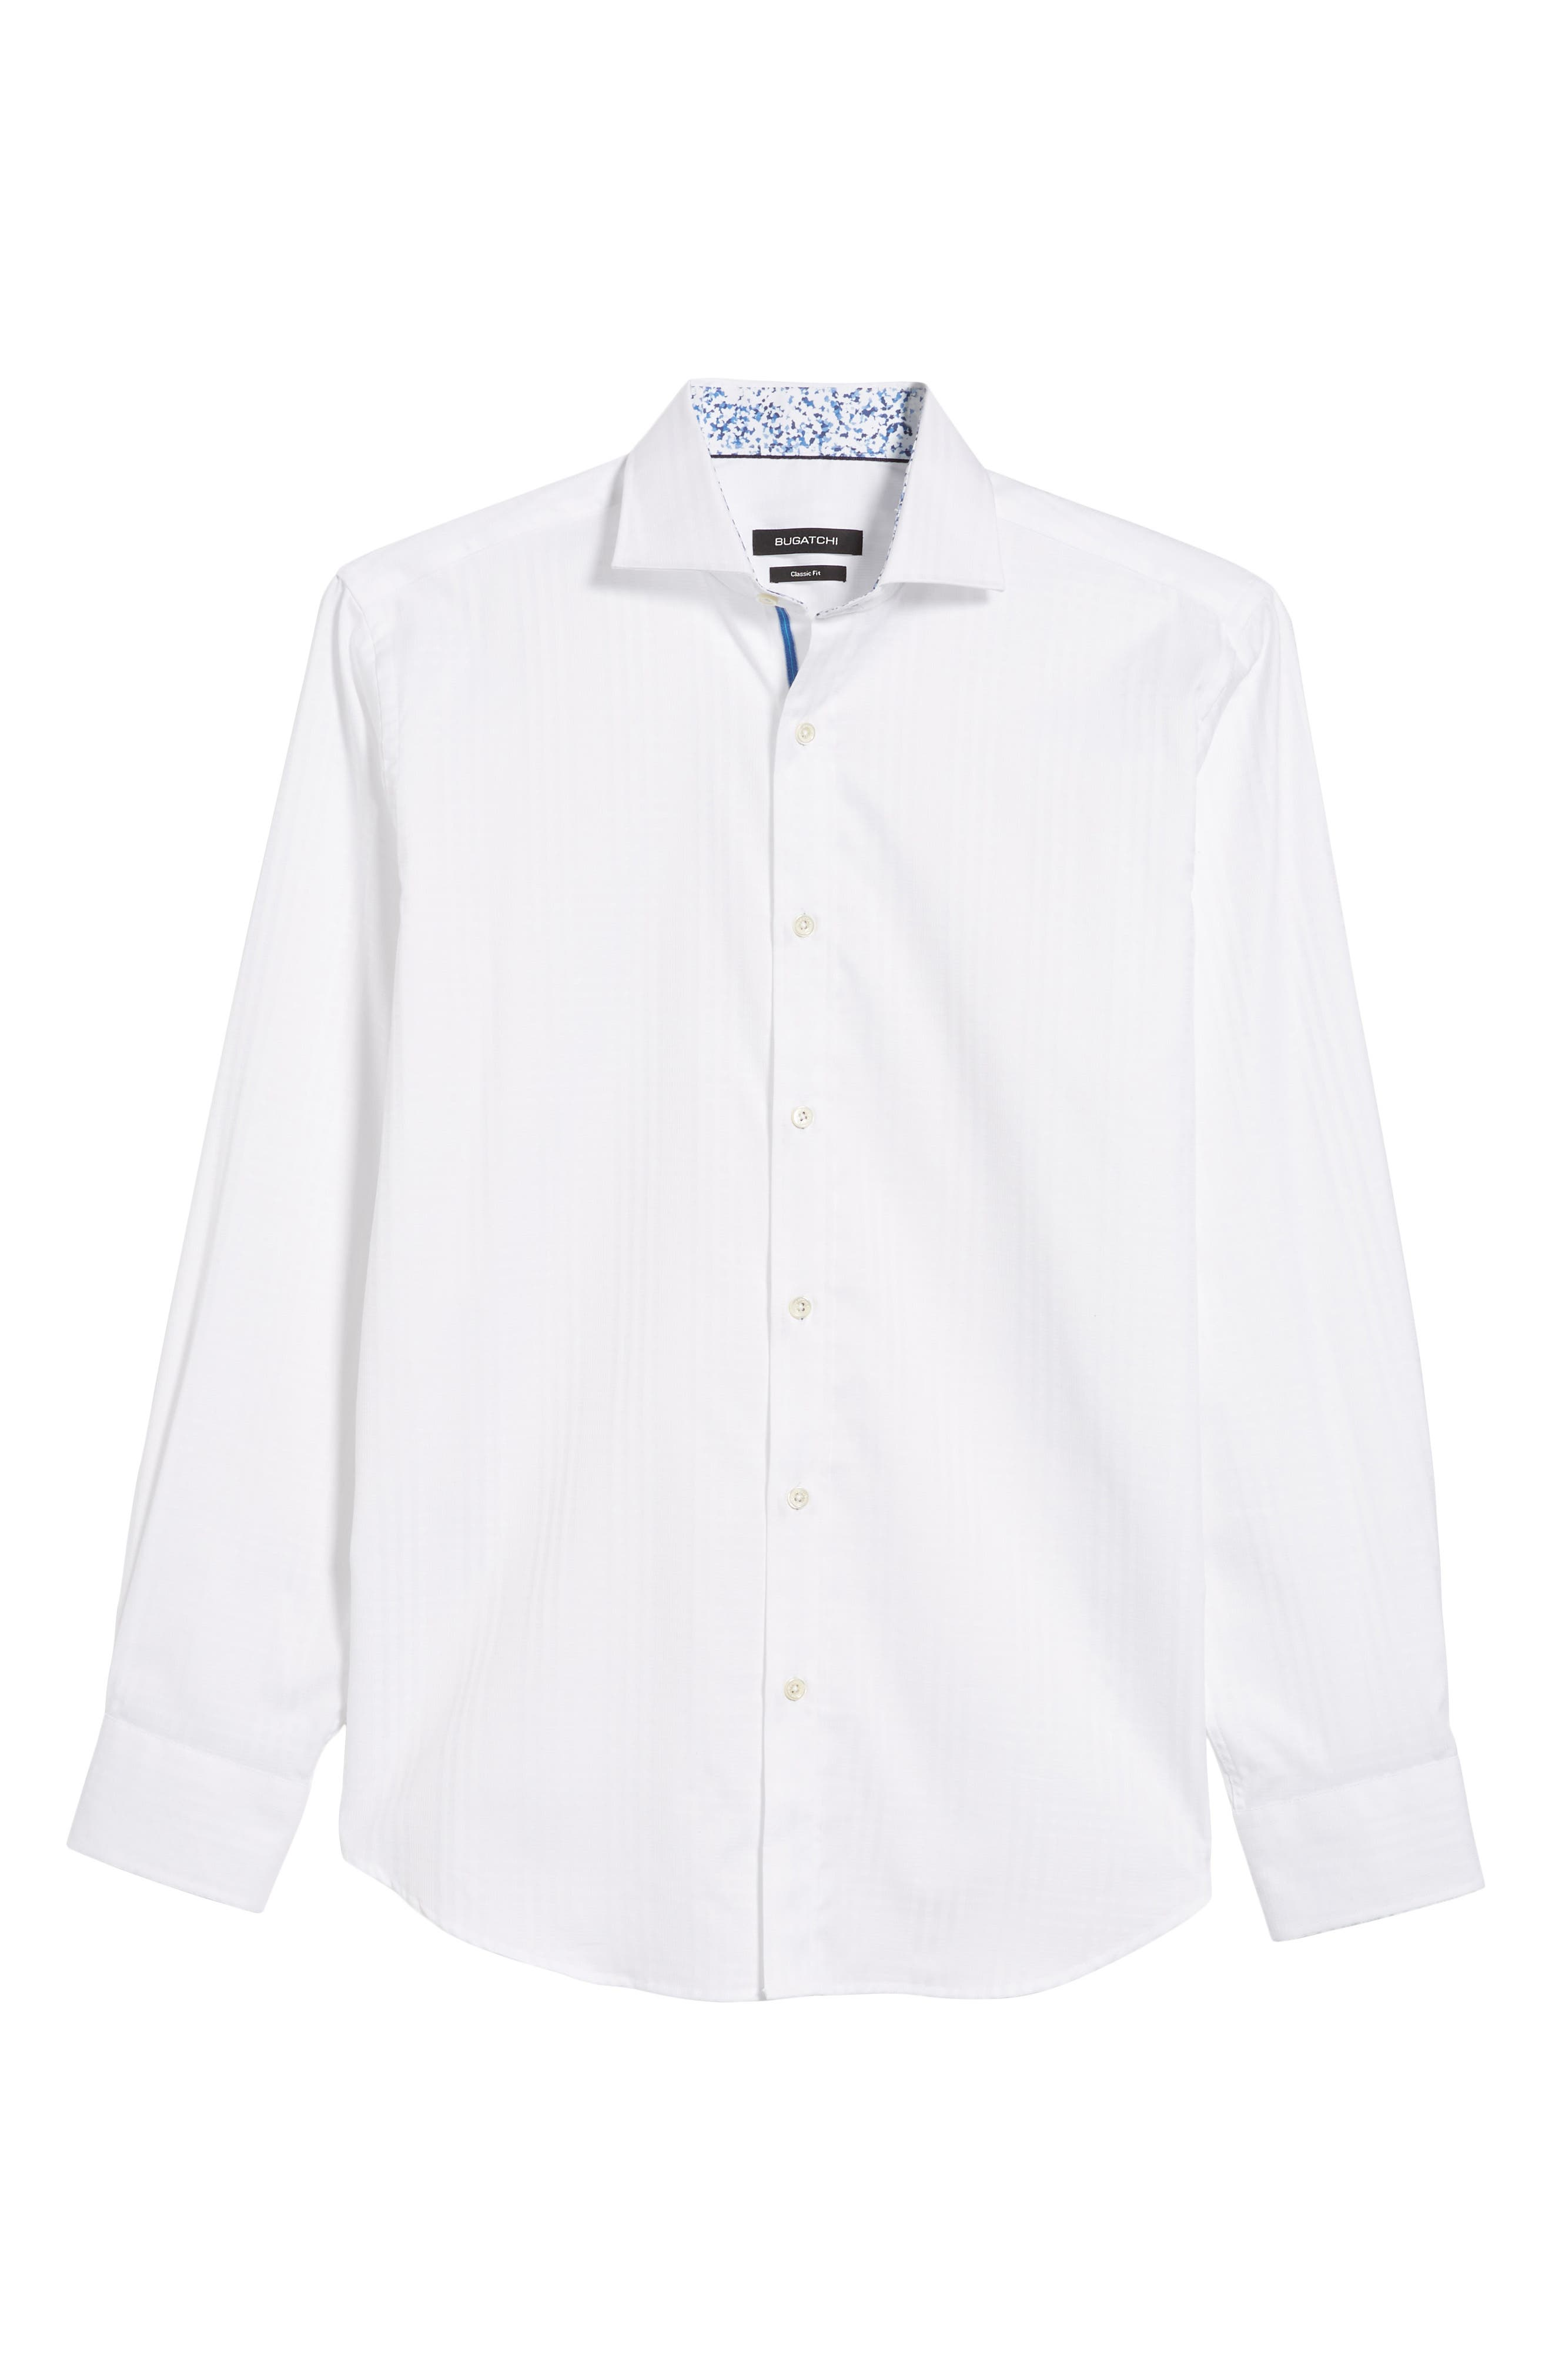 Classic Fit Sport Shirt,                             Alternate thumbnail 6, color,                             100